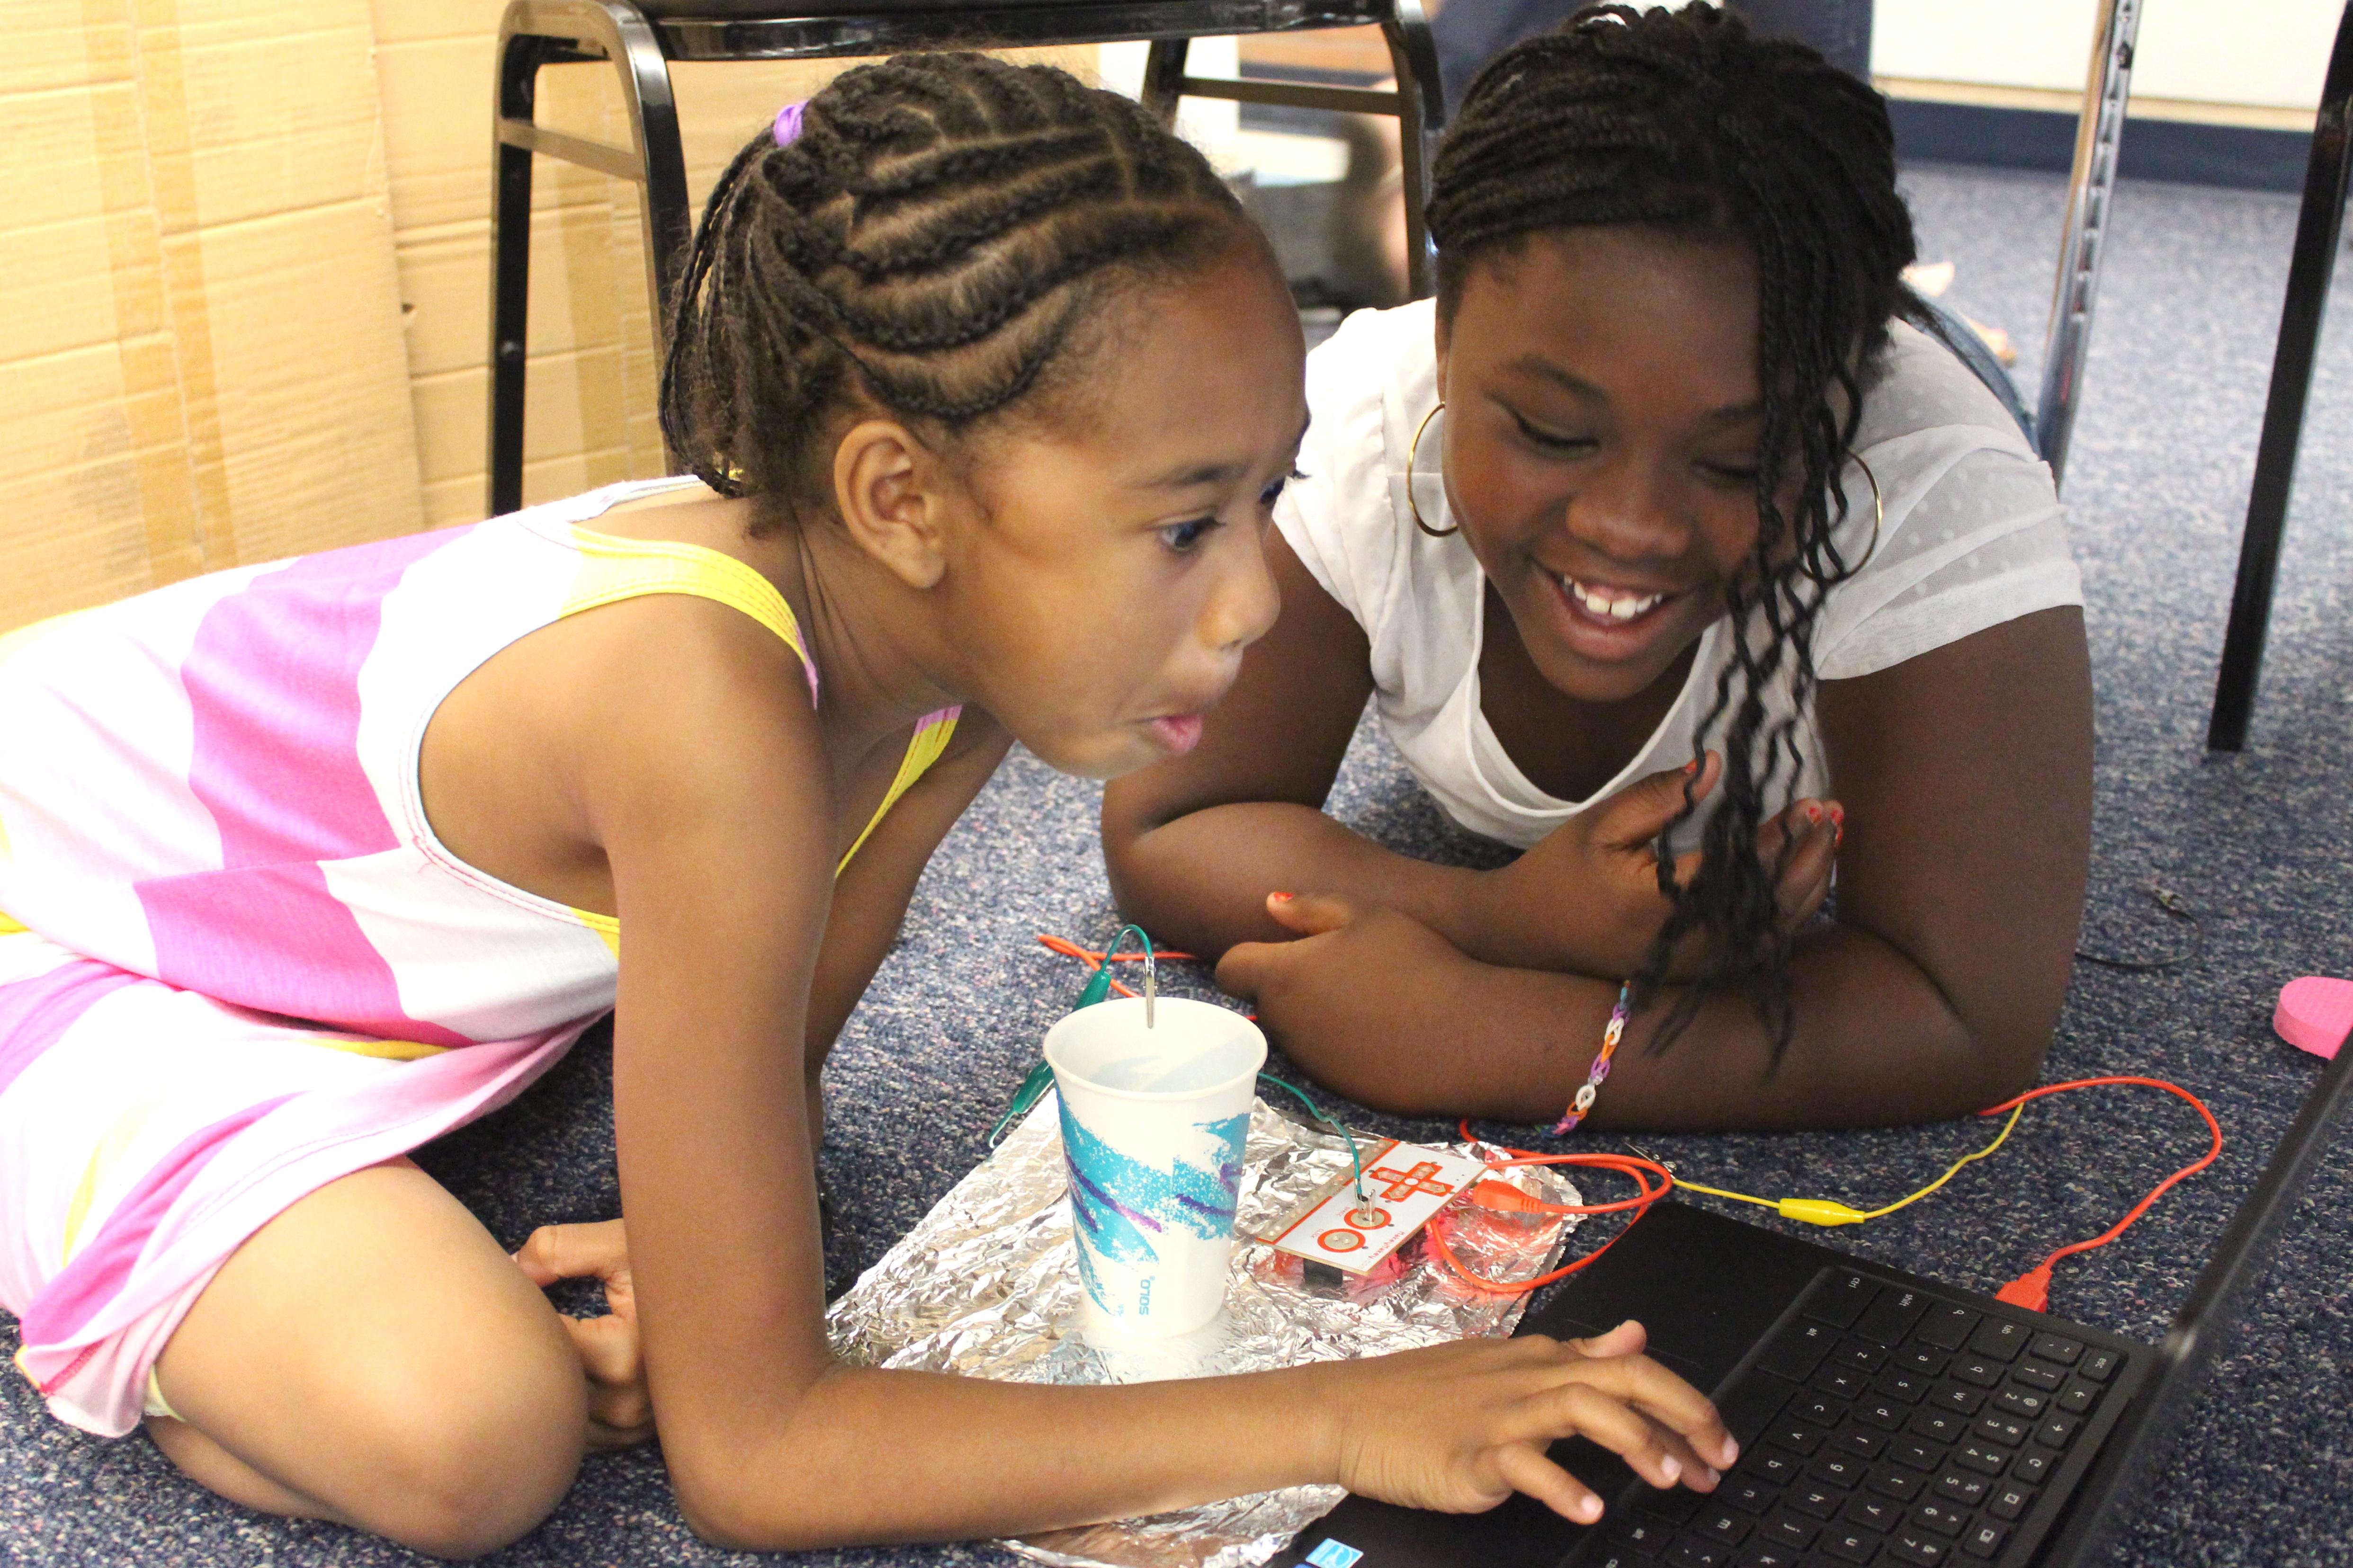 Students Maliah and Kayla at the Imaginarium's Summer Lab camp at Columbine Elementary School.